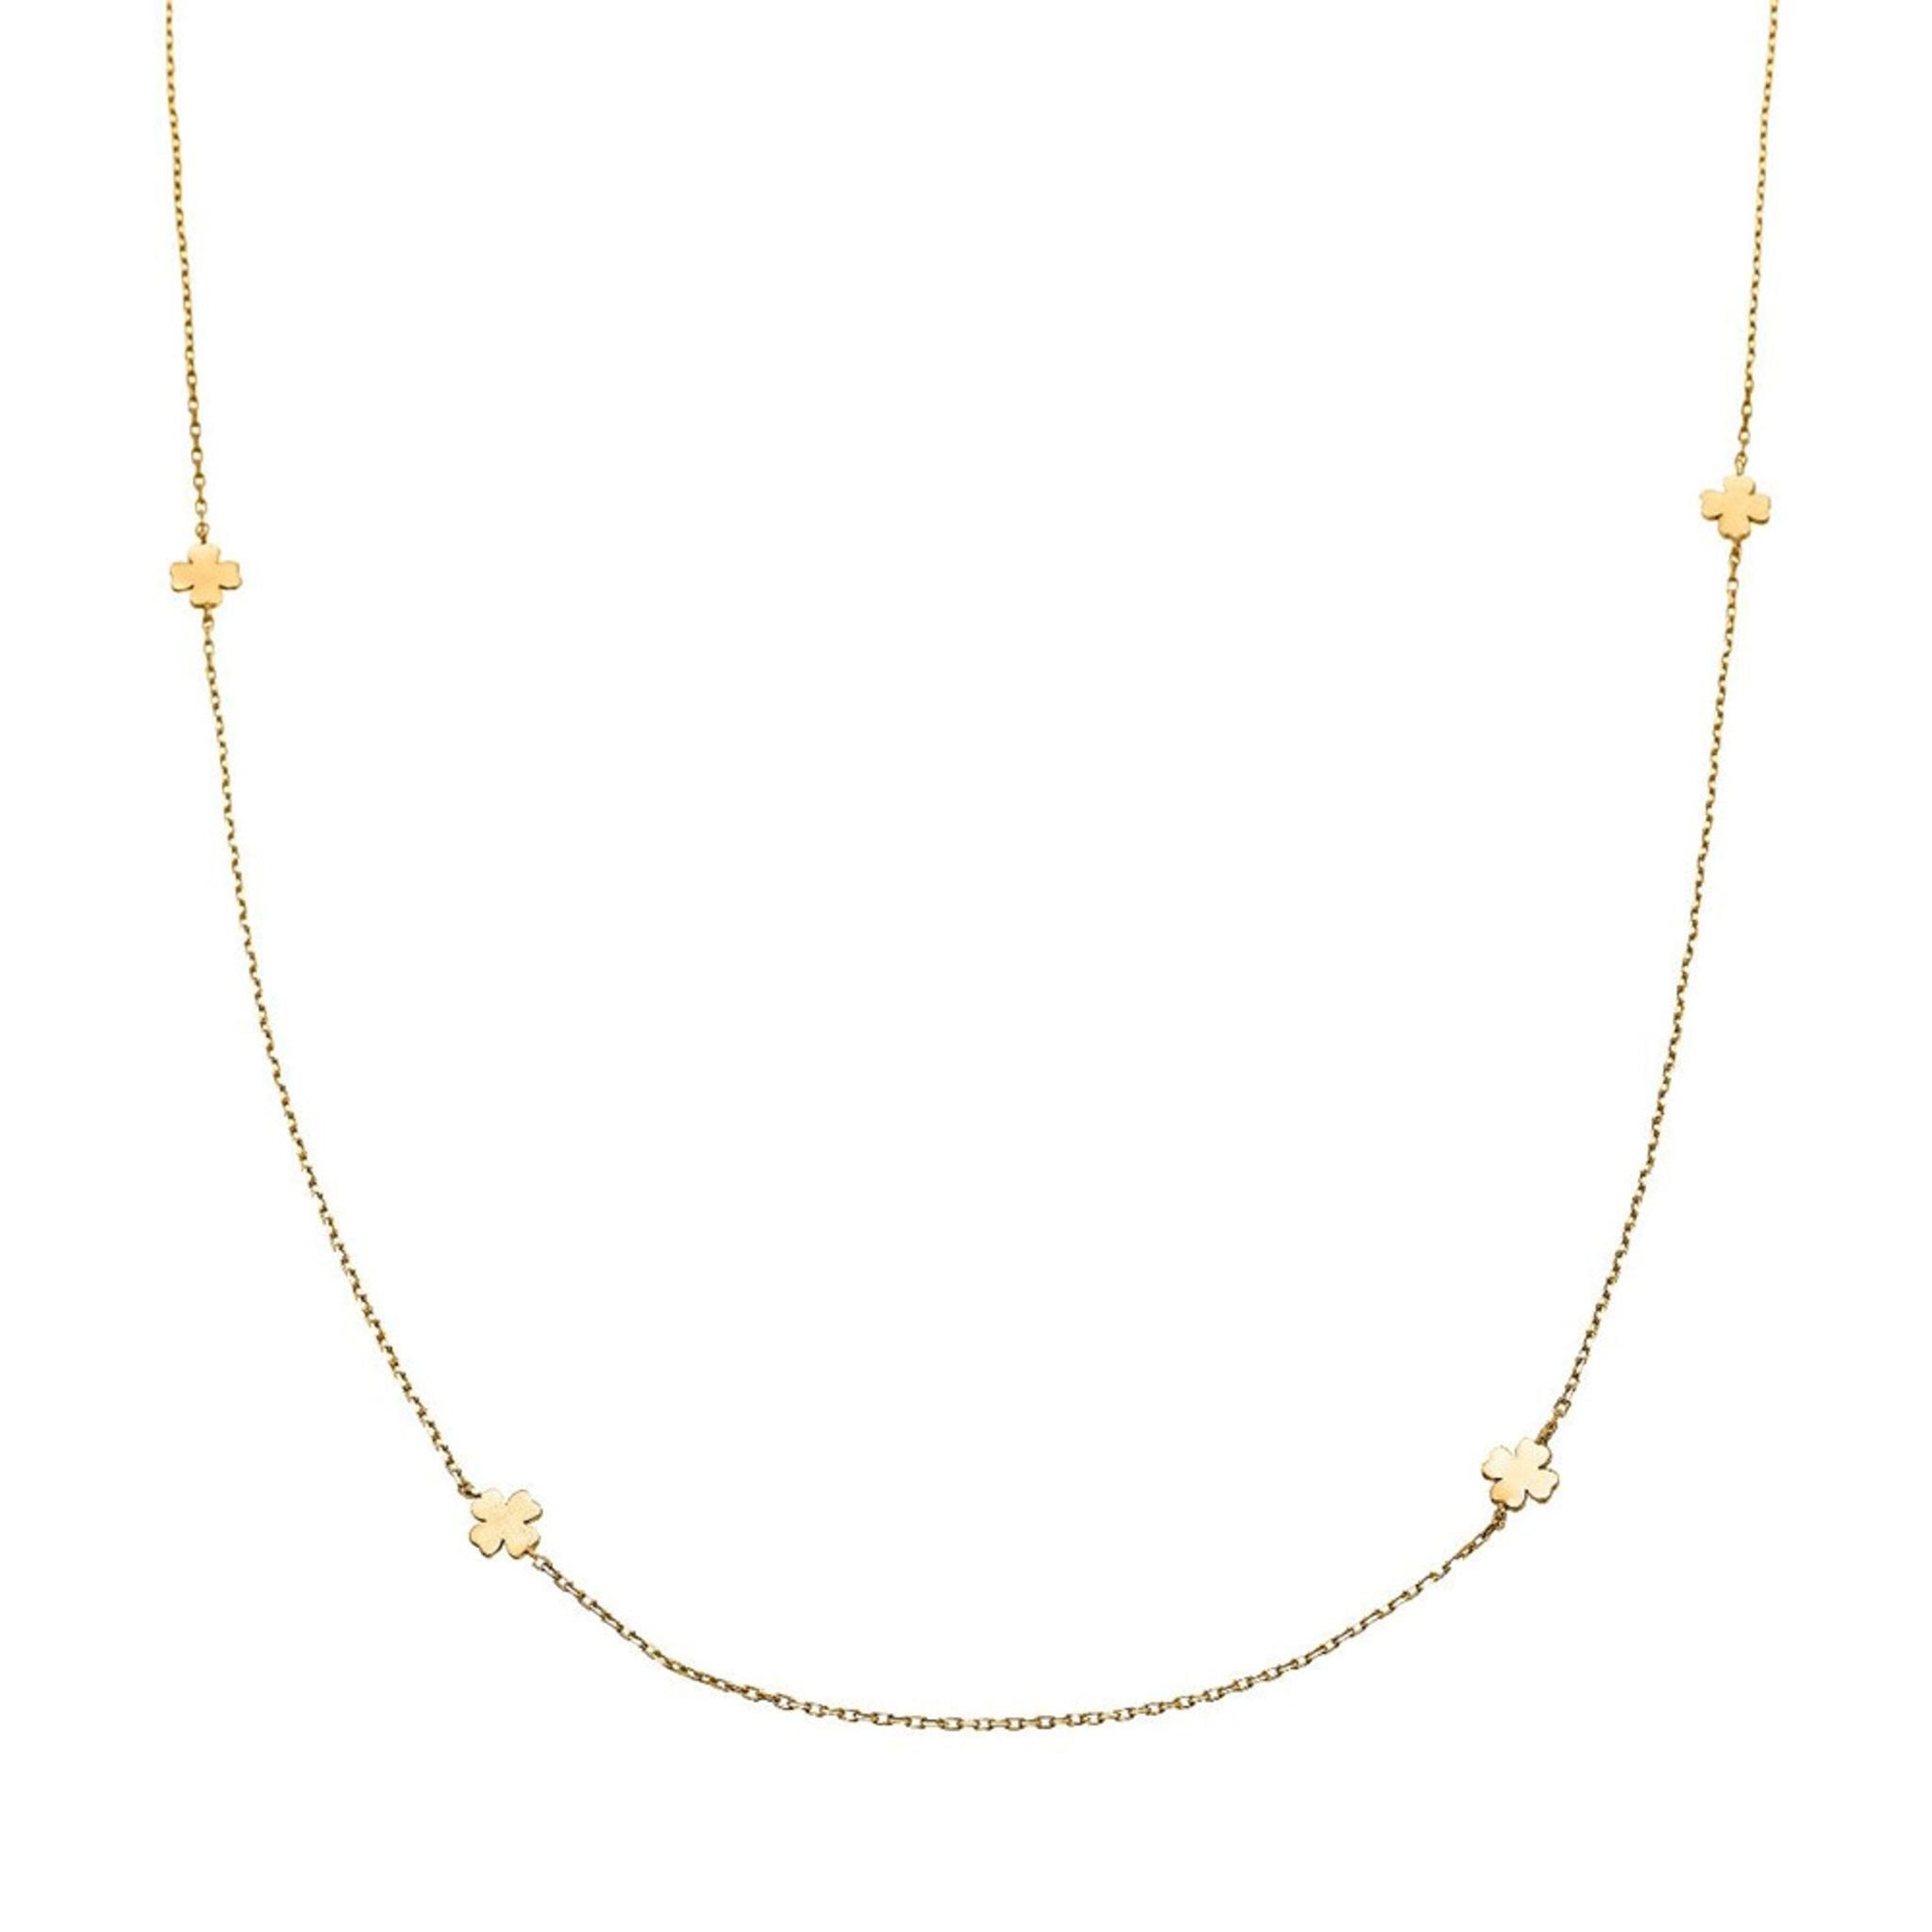 Lucky Necklace Mini Multi Gold - Halsband - Köp online på åhlens.se! 4cb00da0a5d81